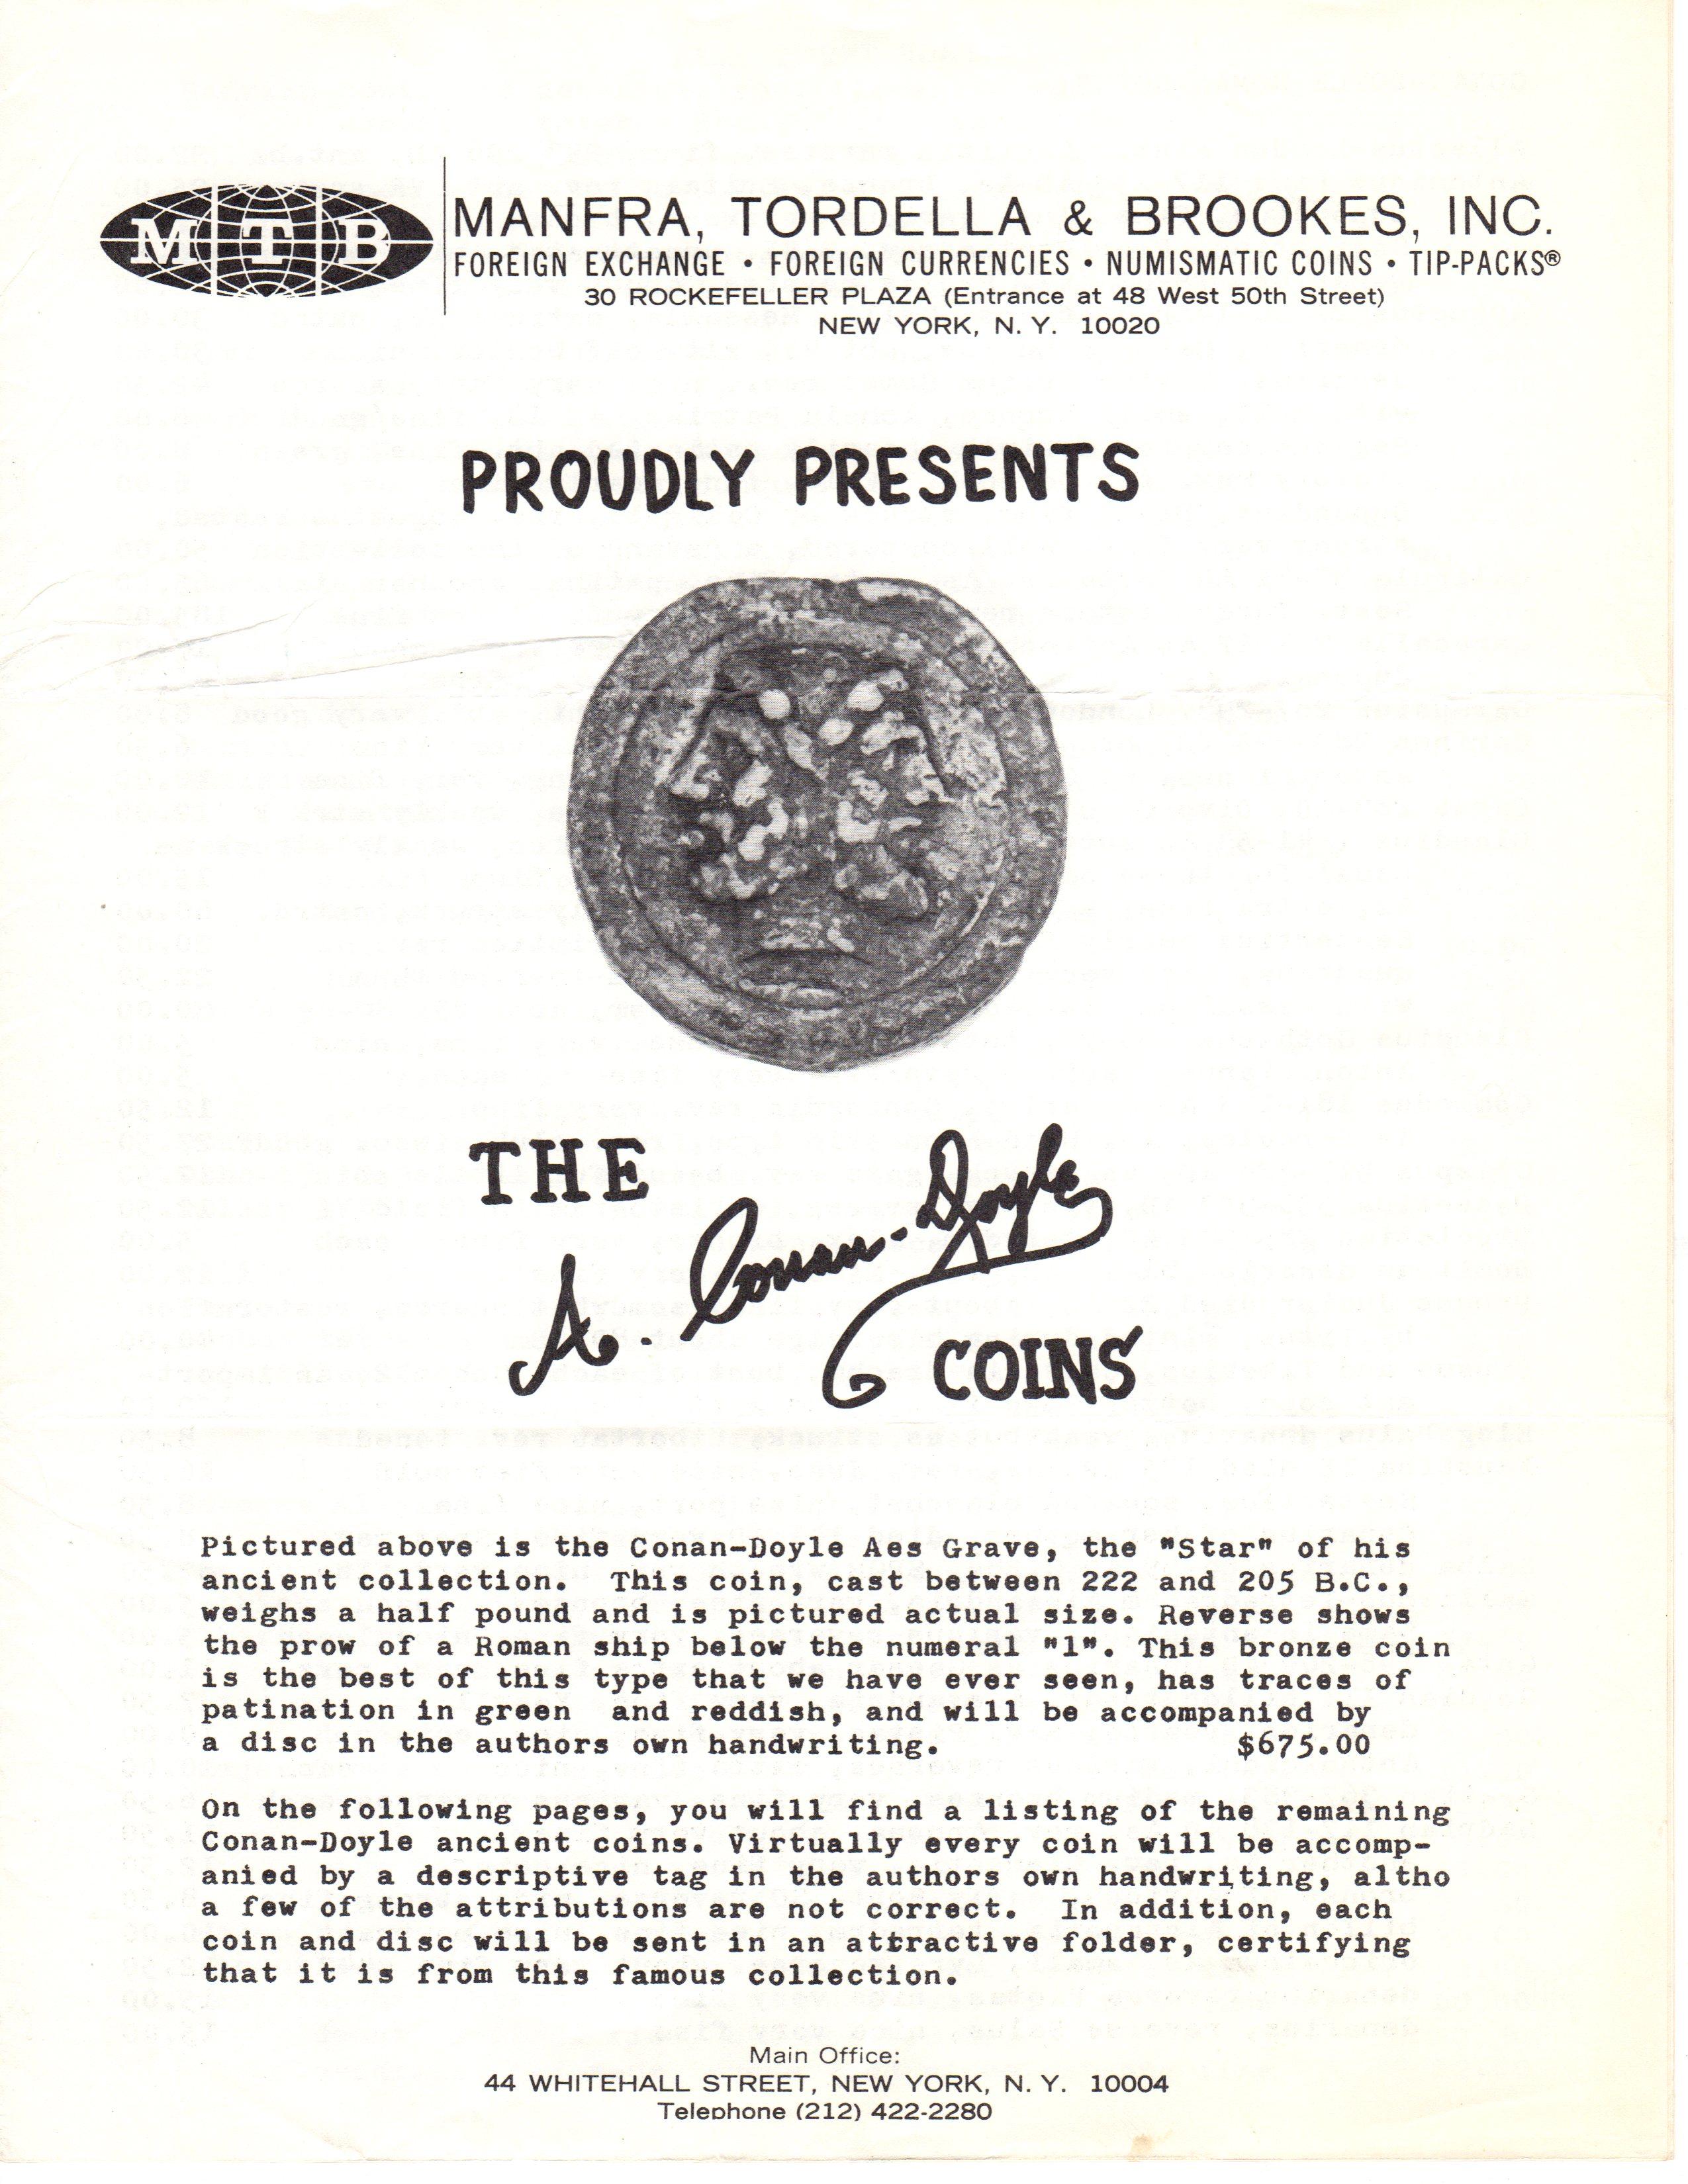 MTB's 1968 Price List of Arthur Conan Doyle's Ancient Coin Collection